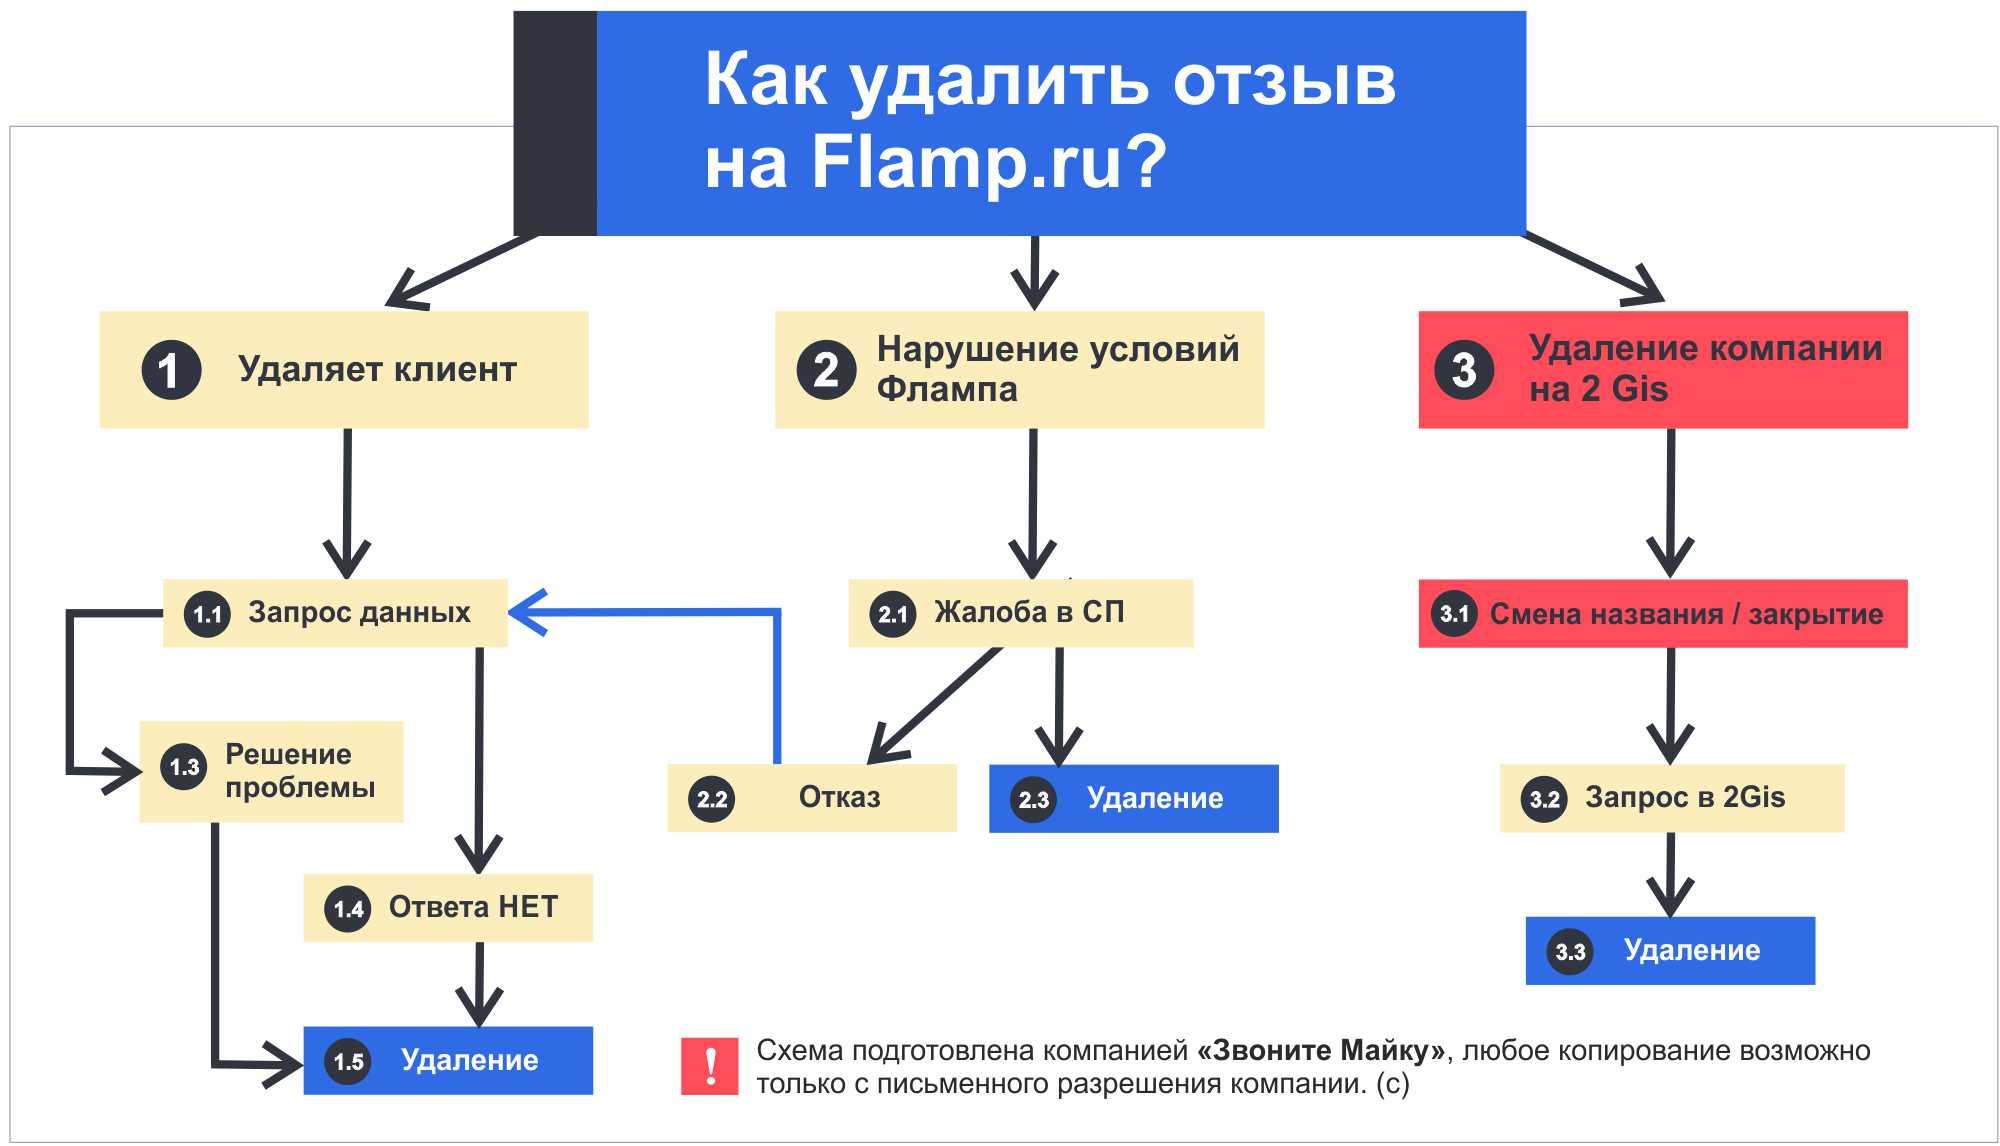 f4ddc3aa64e0f Как удалить отзыв на Флампе? / три проверенных способа - Звоните Майку